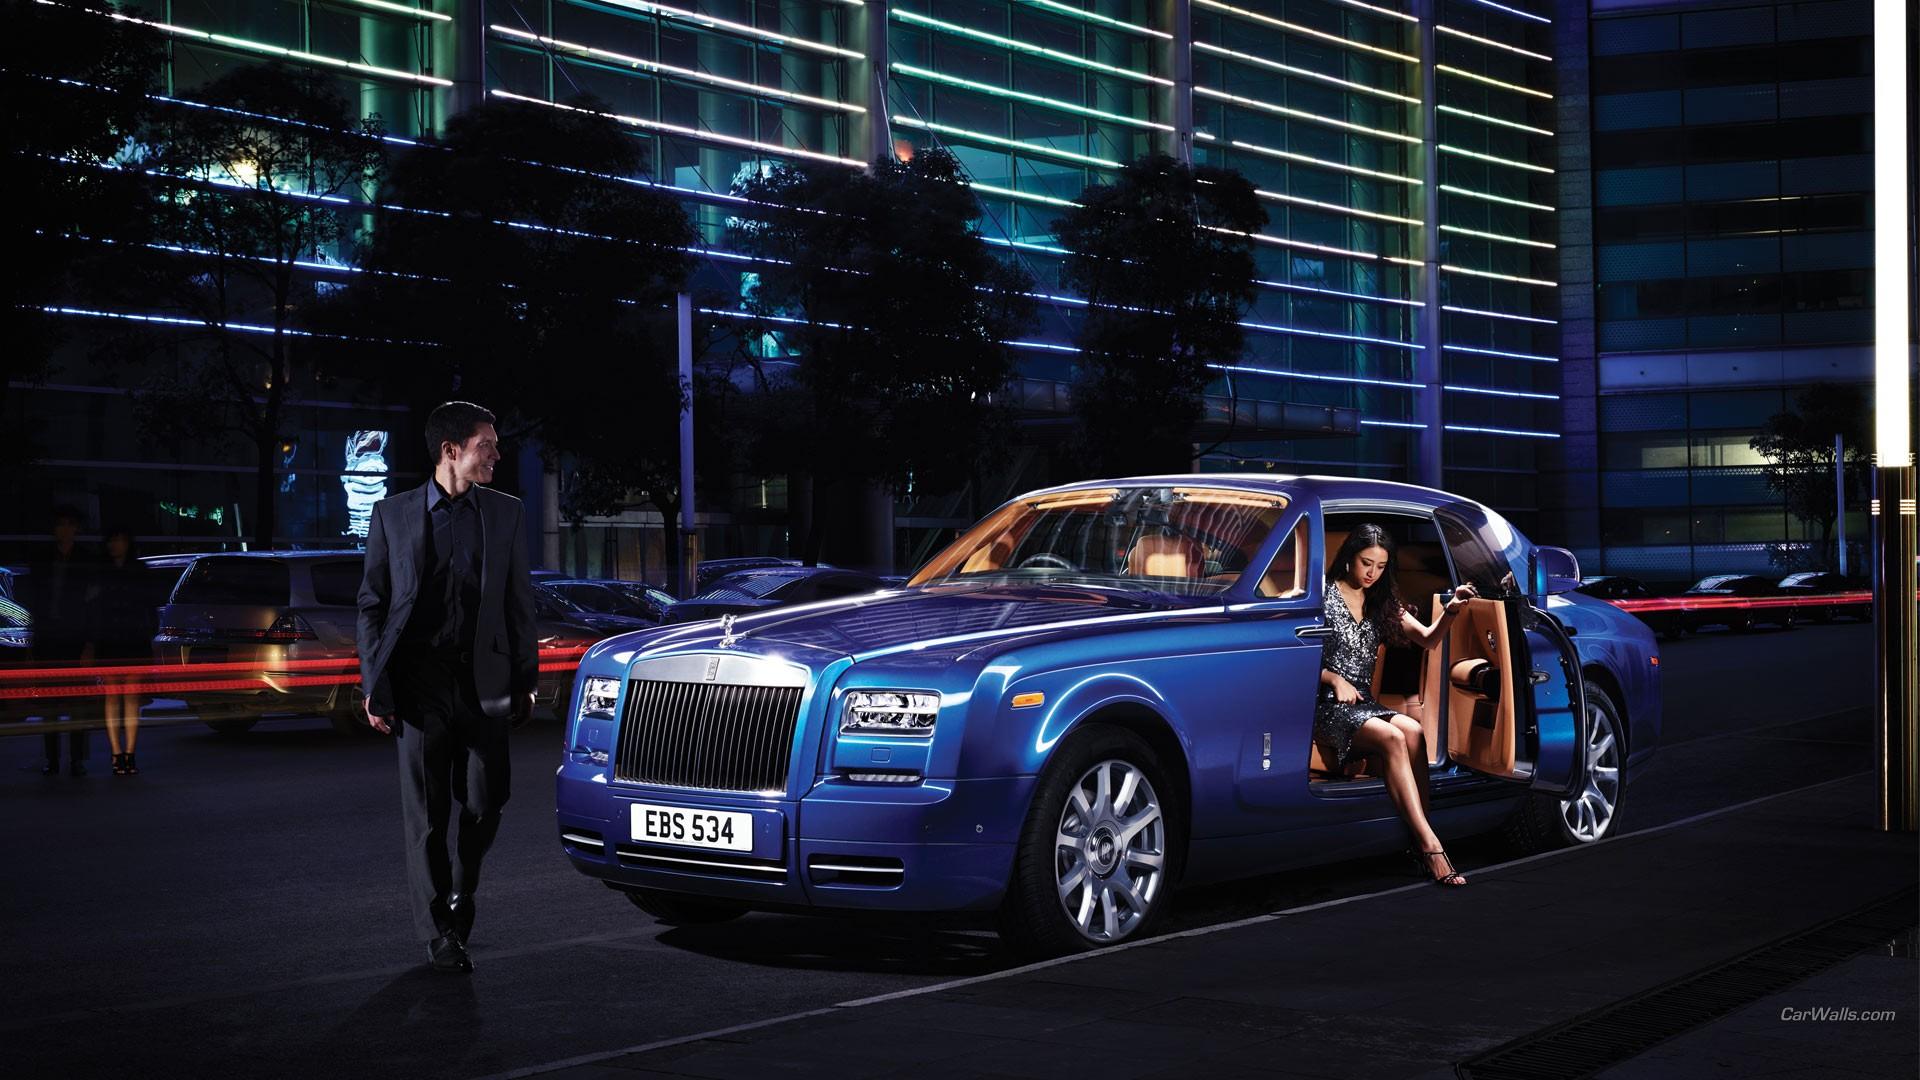 Wallpaper 1920x1080 Px Blue Cars Car Rolls Royce Phantom